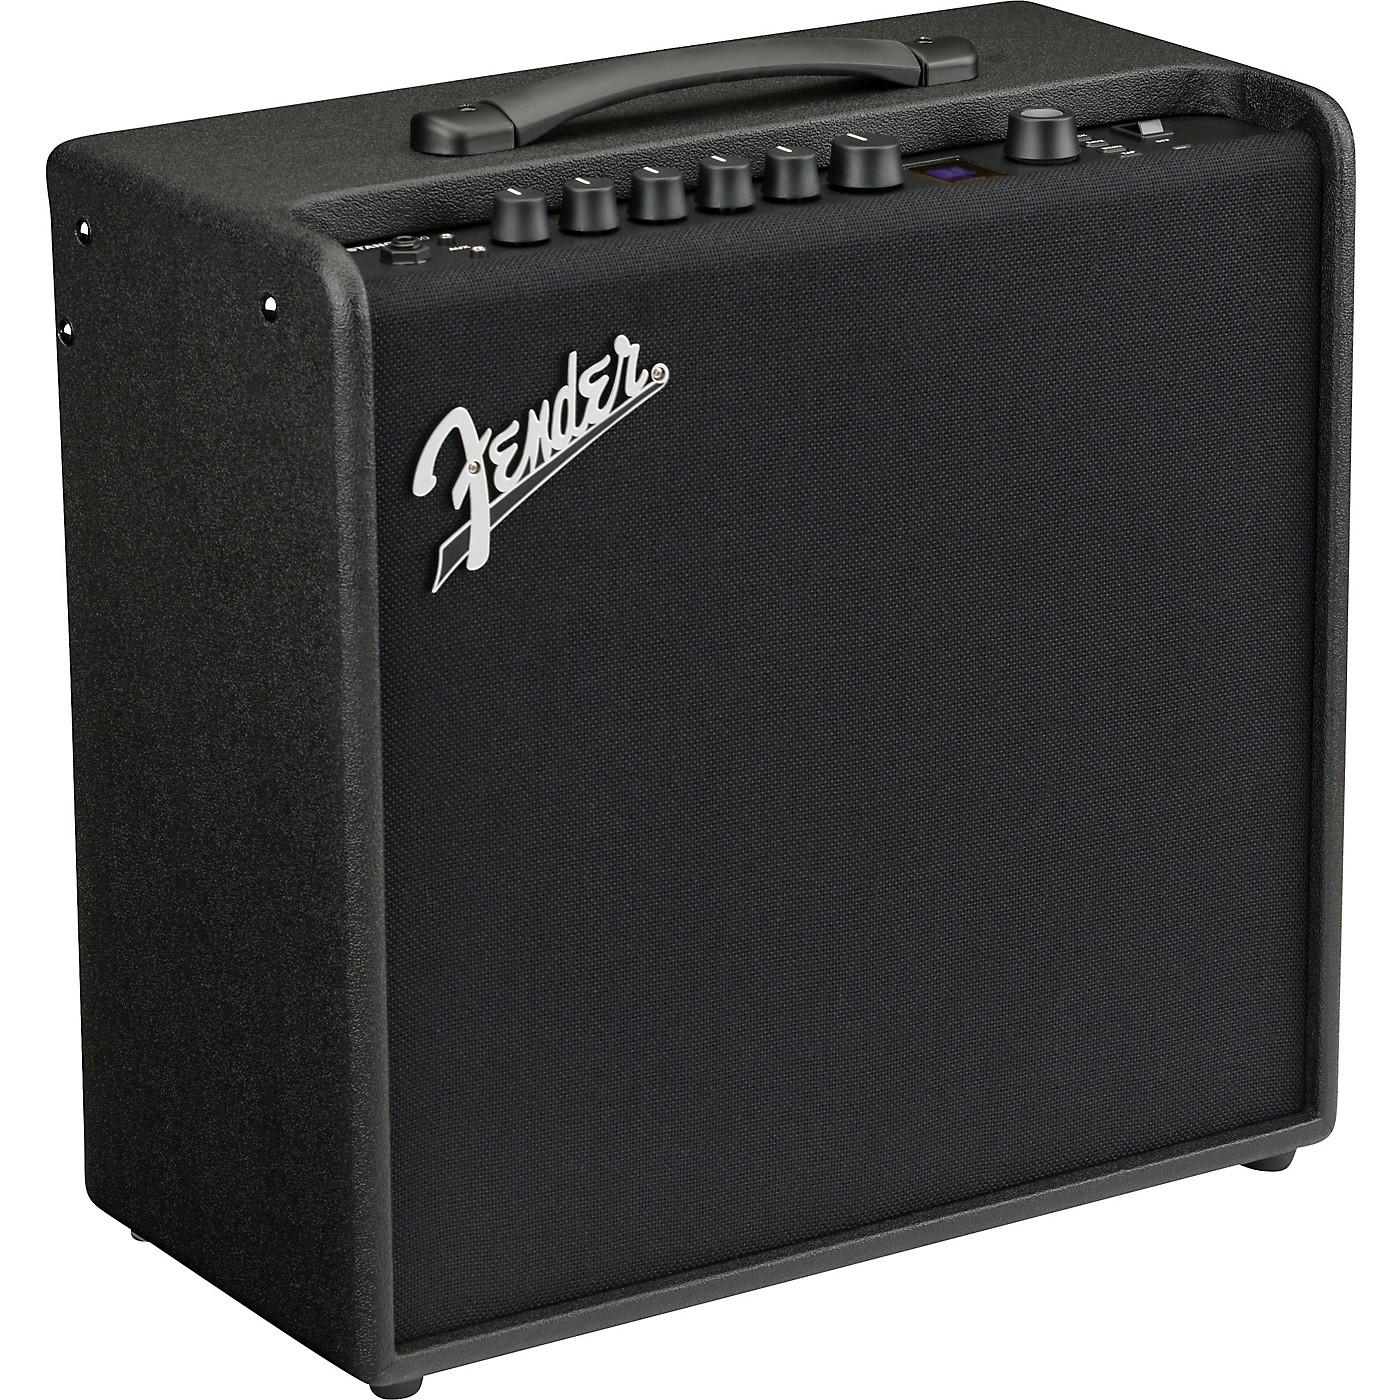 Fender Mustang LT50 50W 1x12 Guitar Combo Amp thumbnail